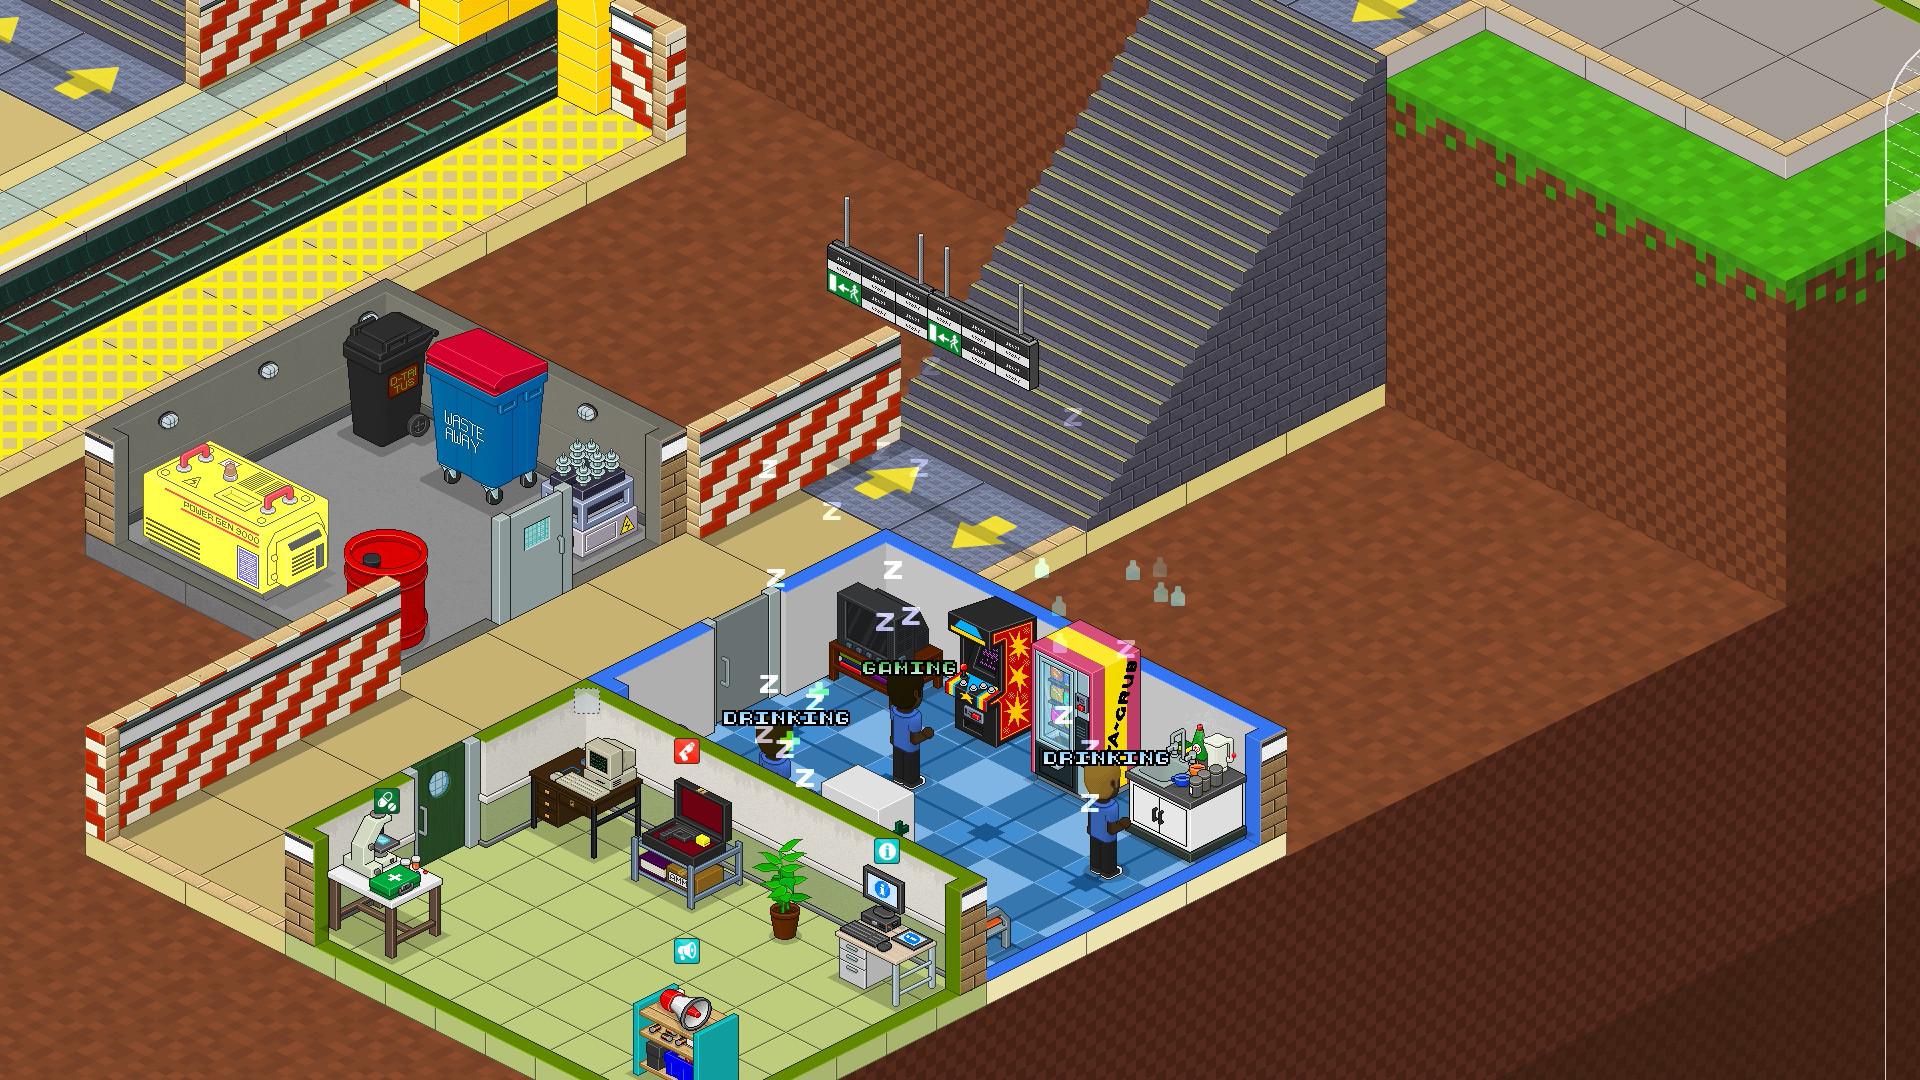 Overcrowd - Staff Room